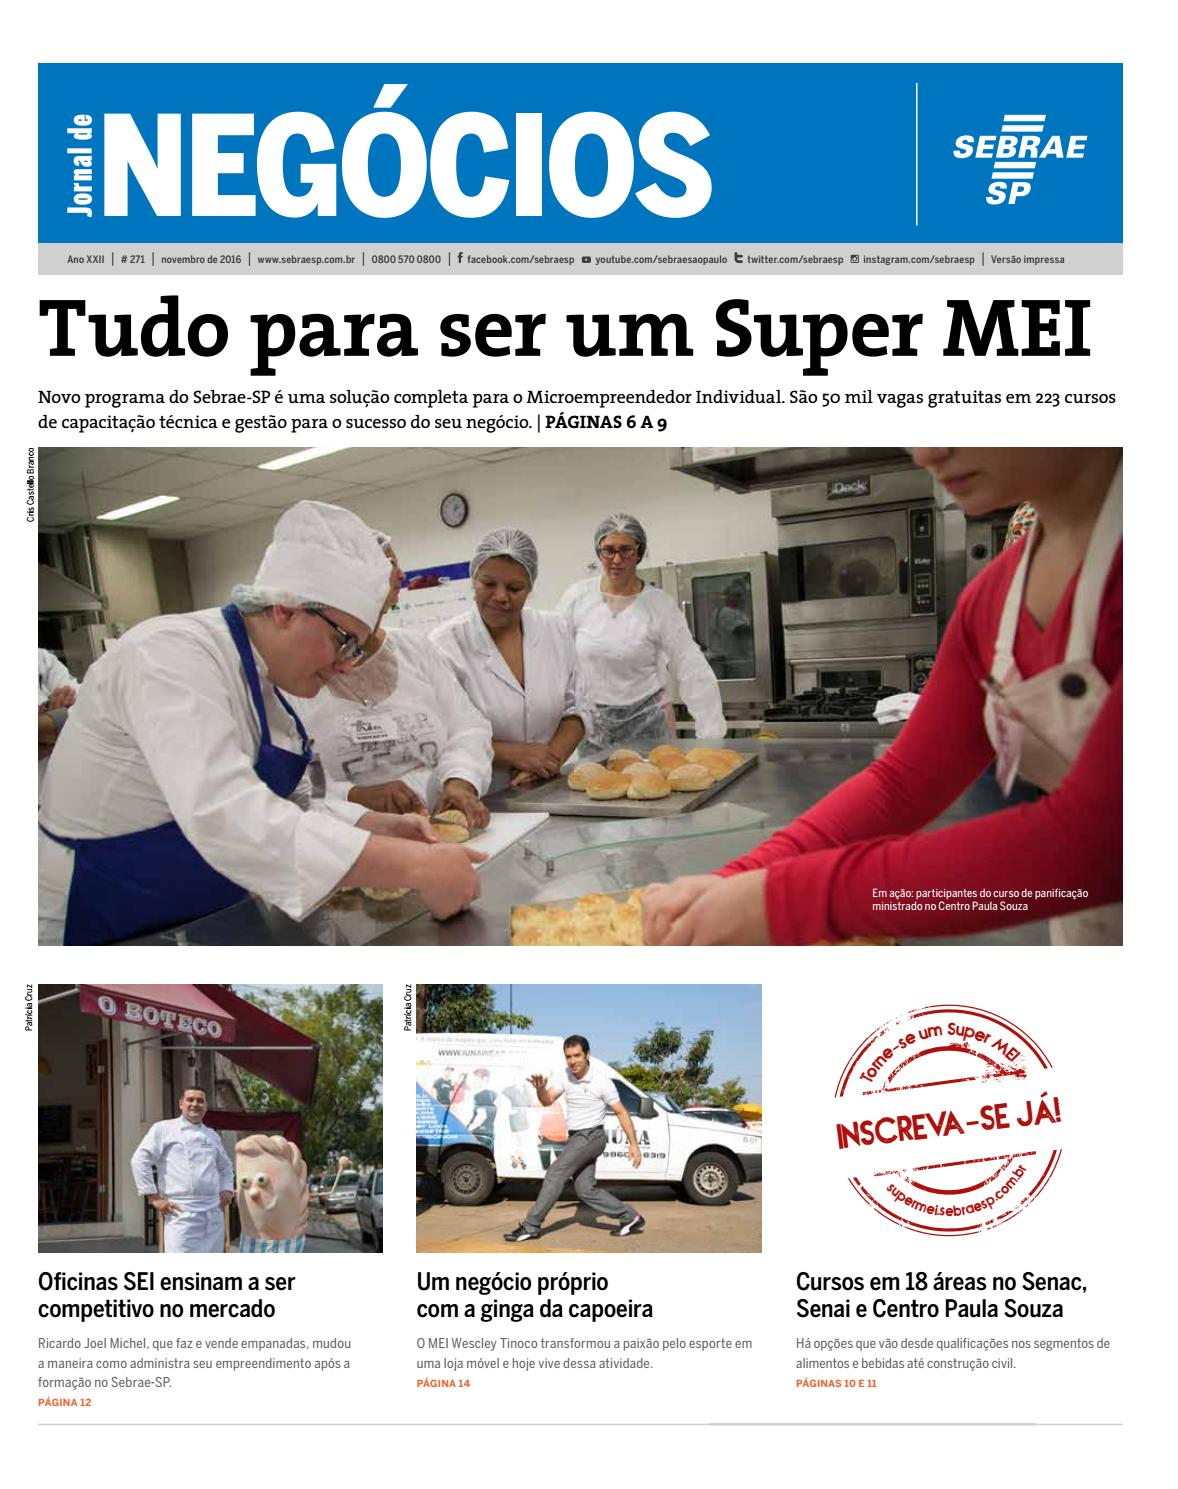 Jornal De Neg Cios Sebrae Sp 01 De Novembro De 2016 By Sebrae Sp